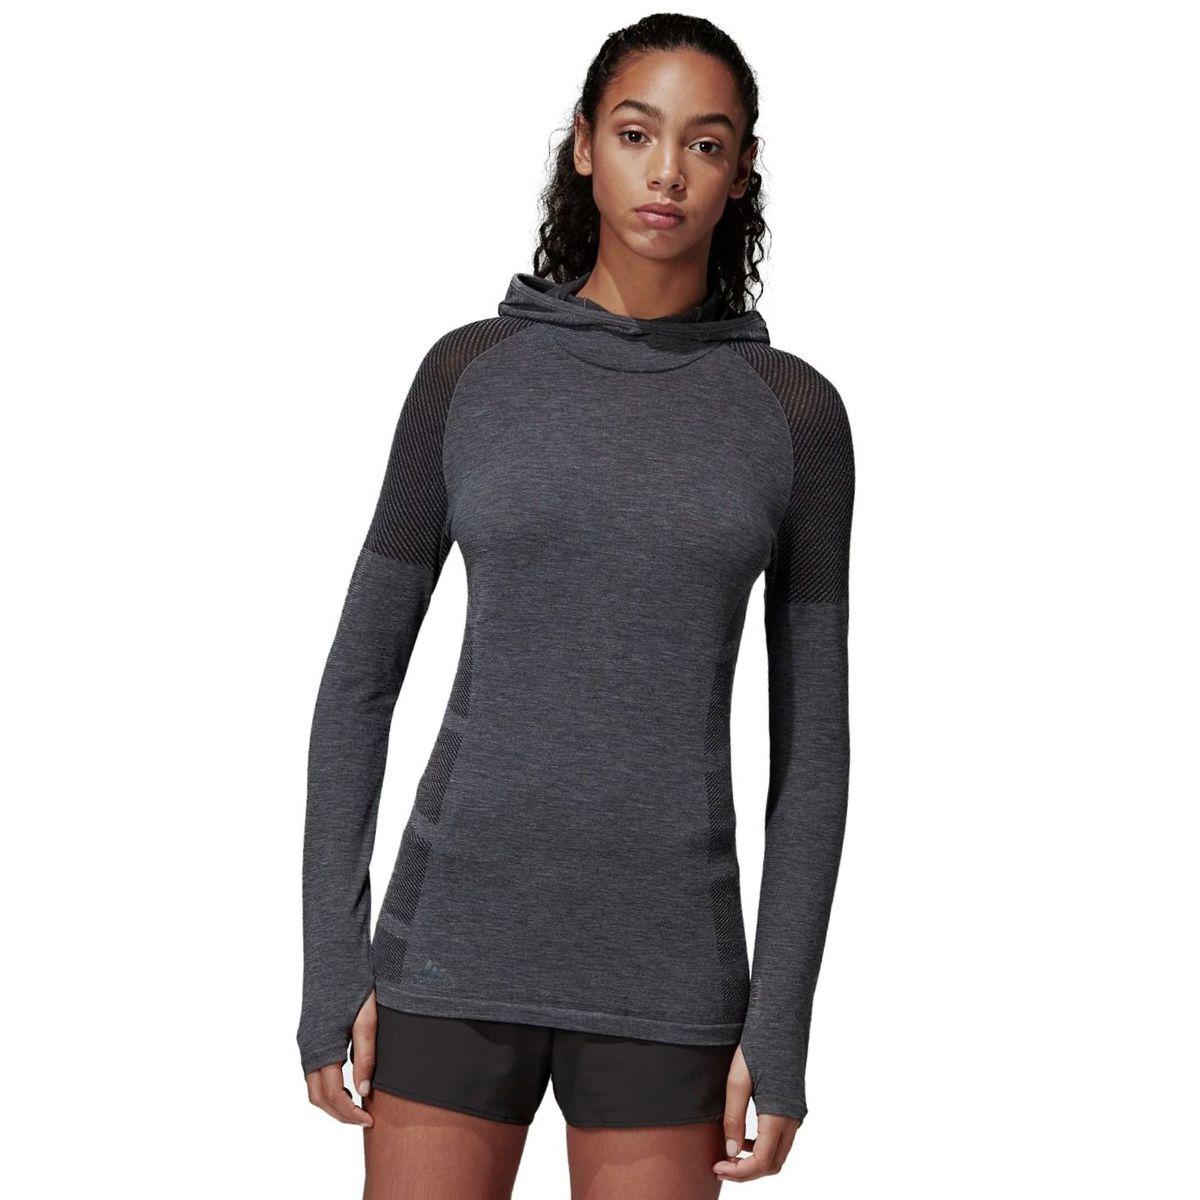 Adidas Ultra Climaheat Primeknit Hooded Shirt - Women's